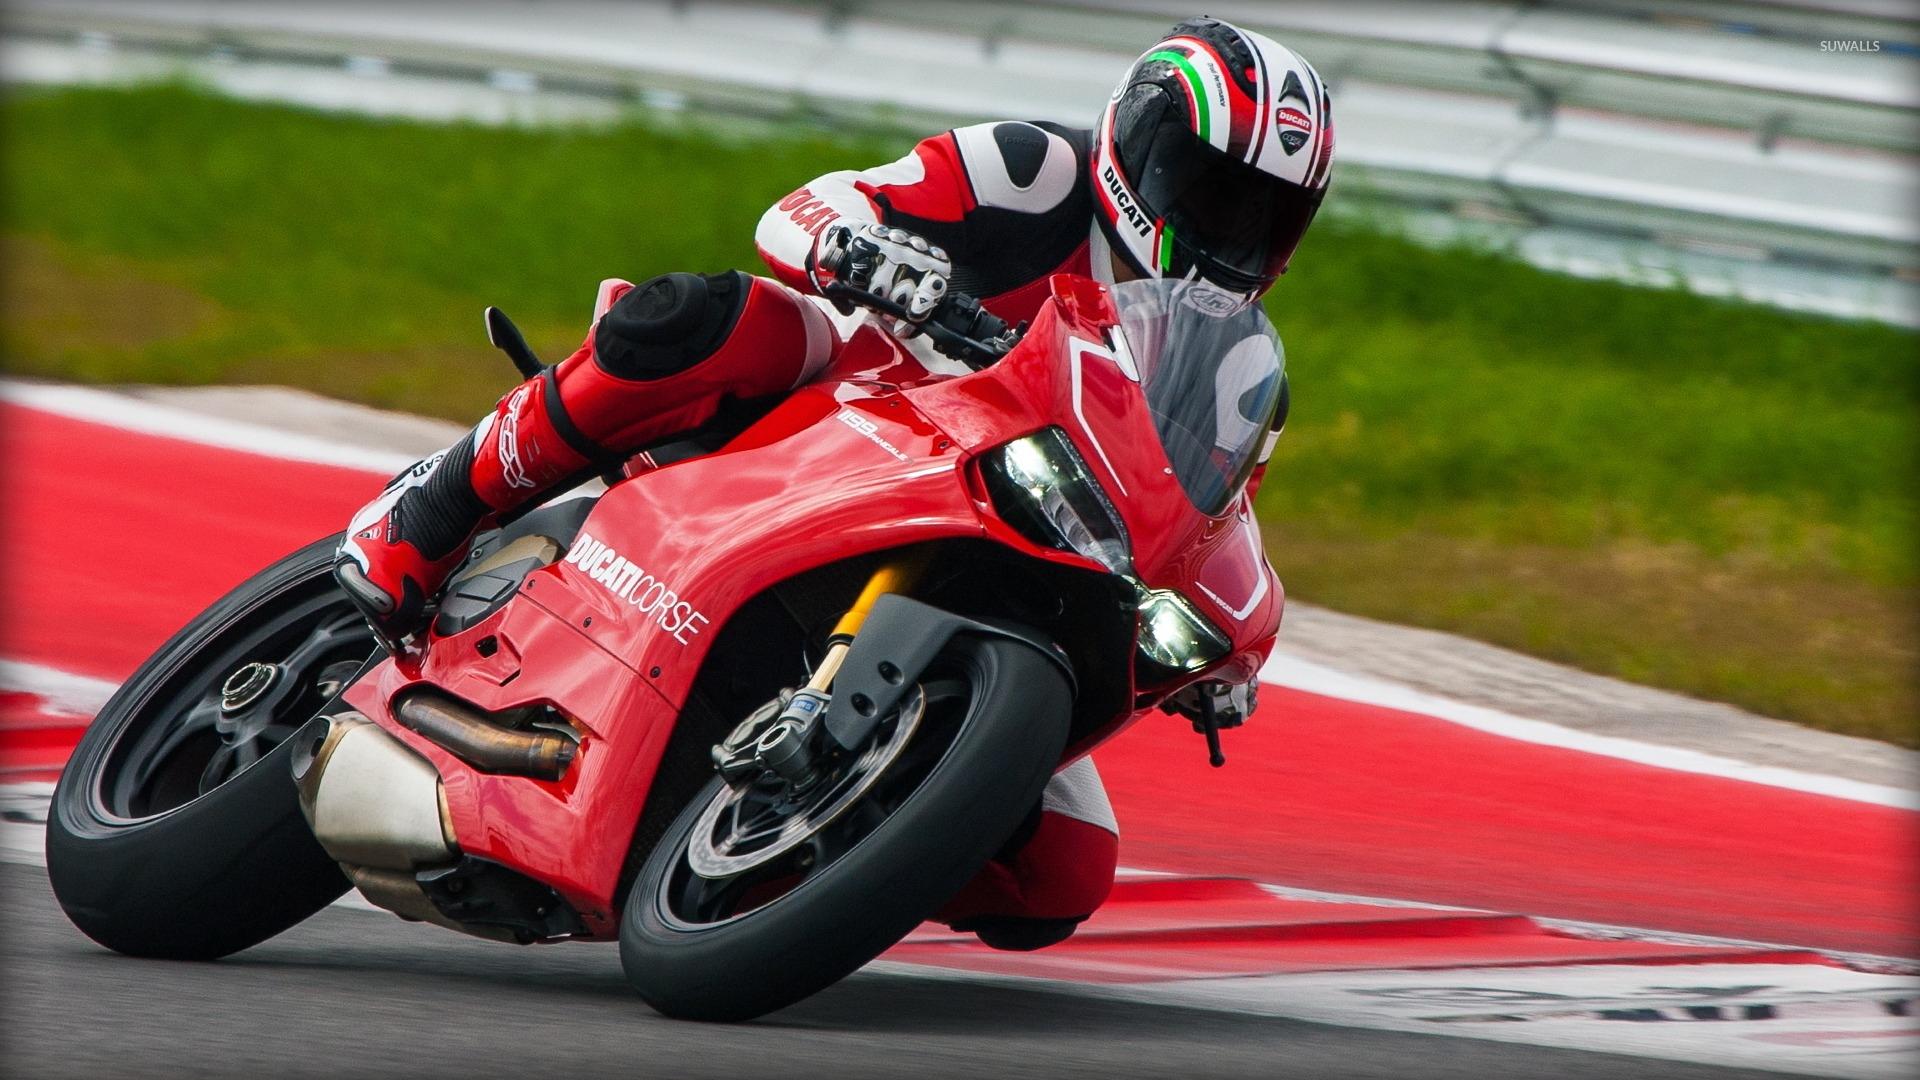 Ducati Corse wallpaper - Sport - 1369.6KB